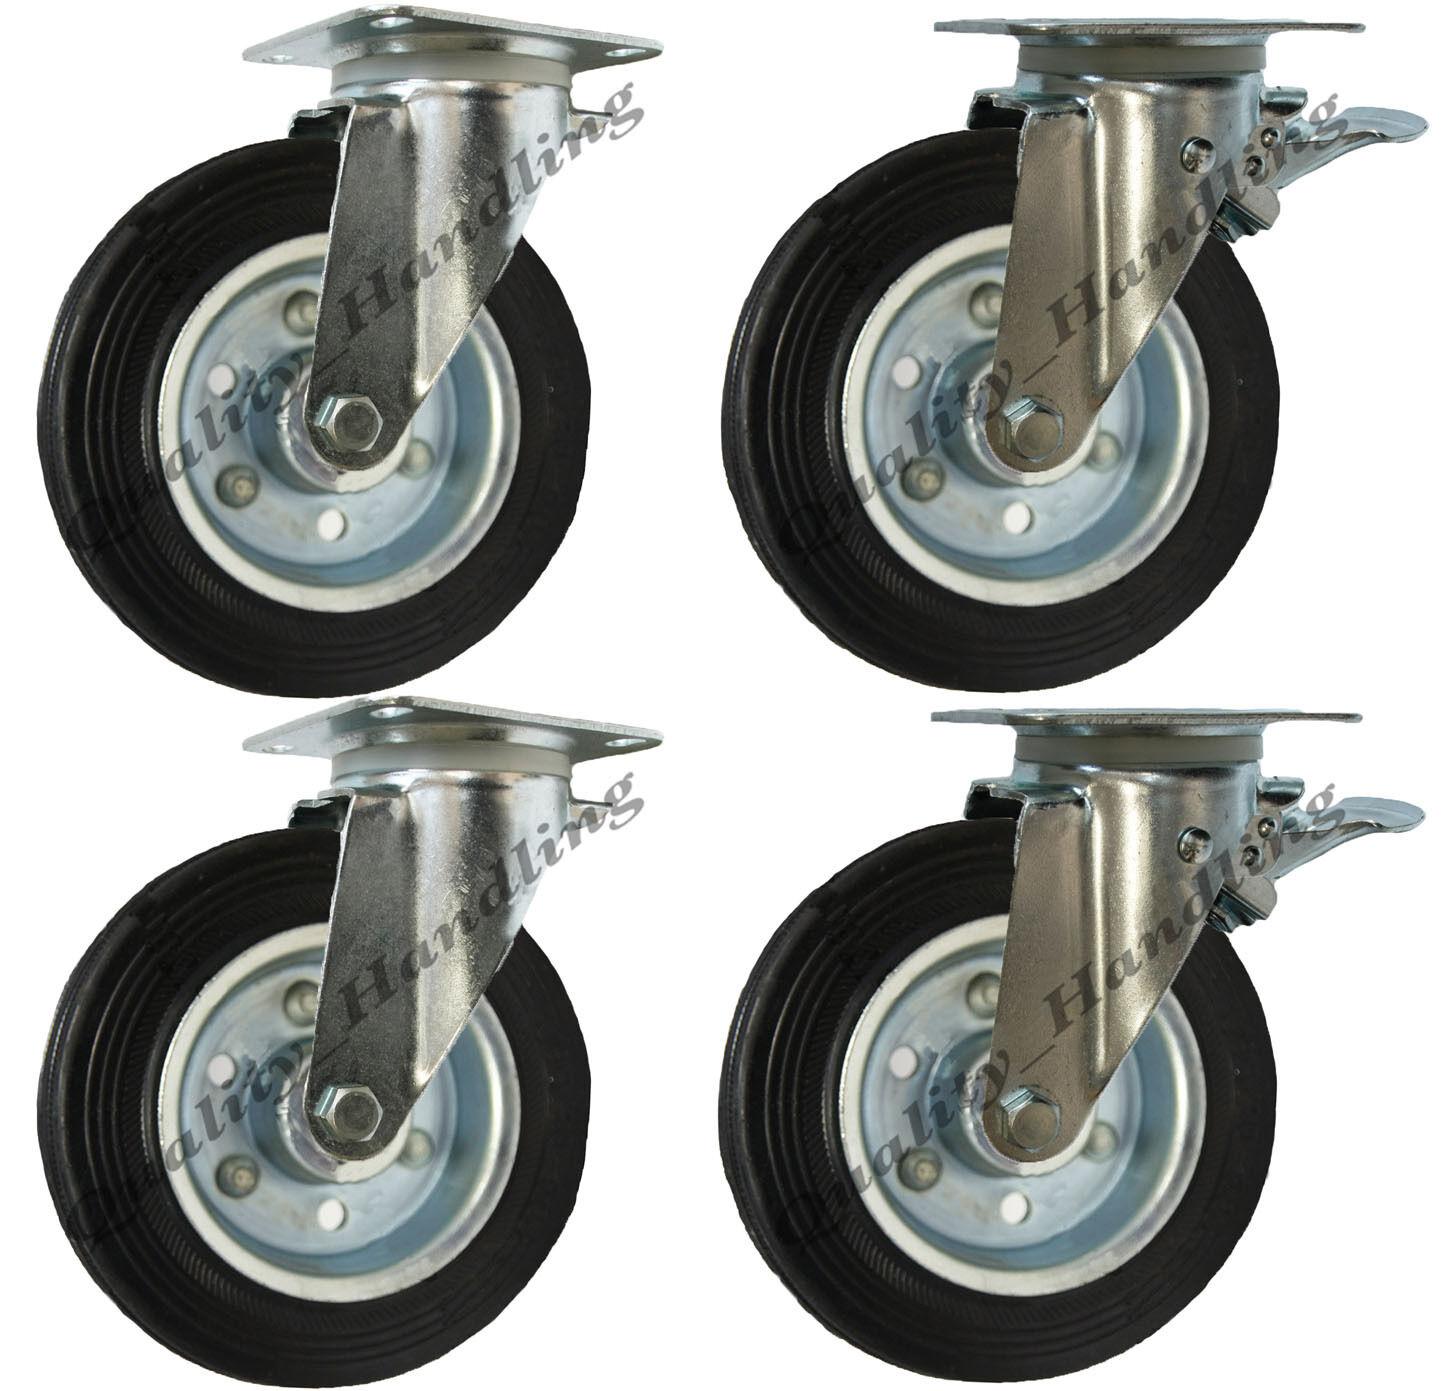 4 - 200mm Gummi Räder Abfallbehälter Abfallbehälter Abfallbehälter Rollen - Dreh & Dreh Gebremste 1100 Liter 6544e7